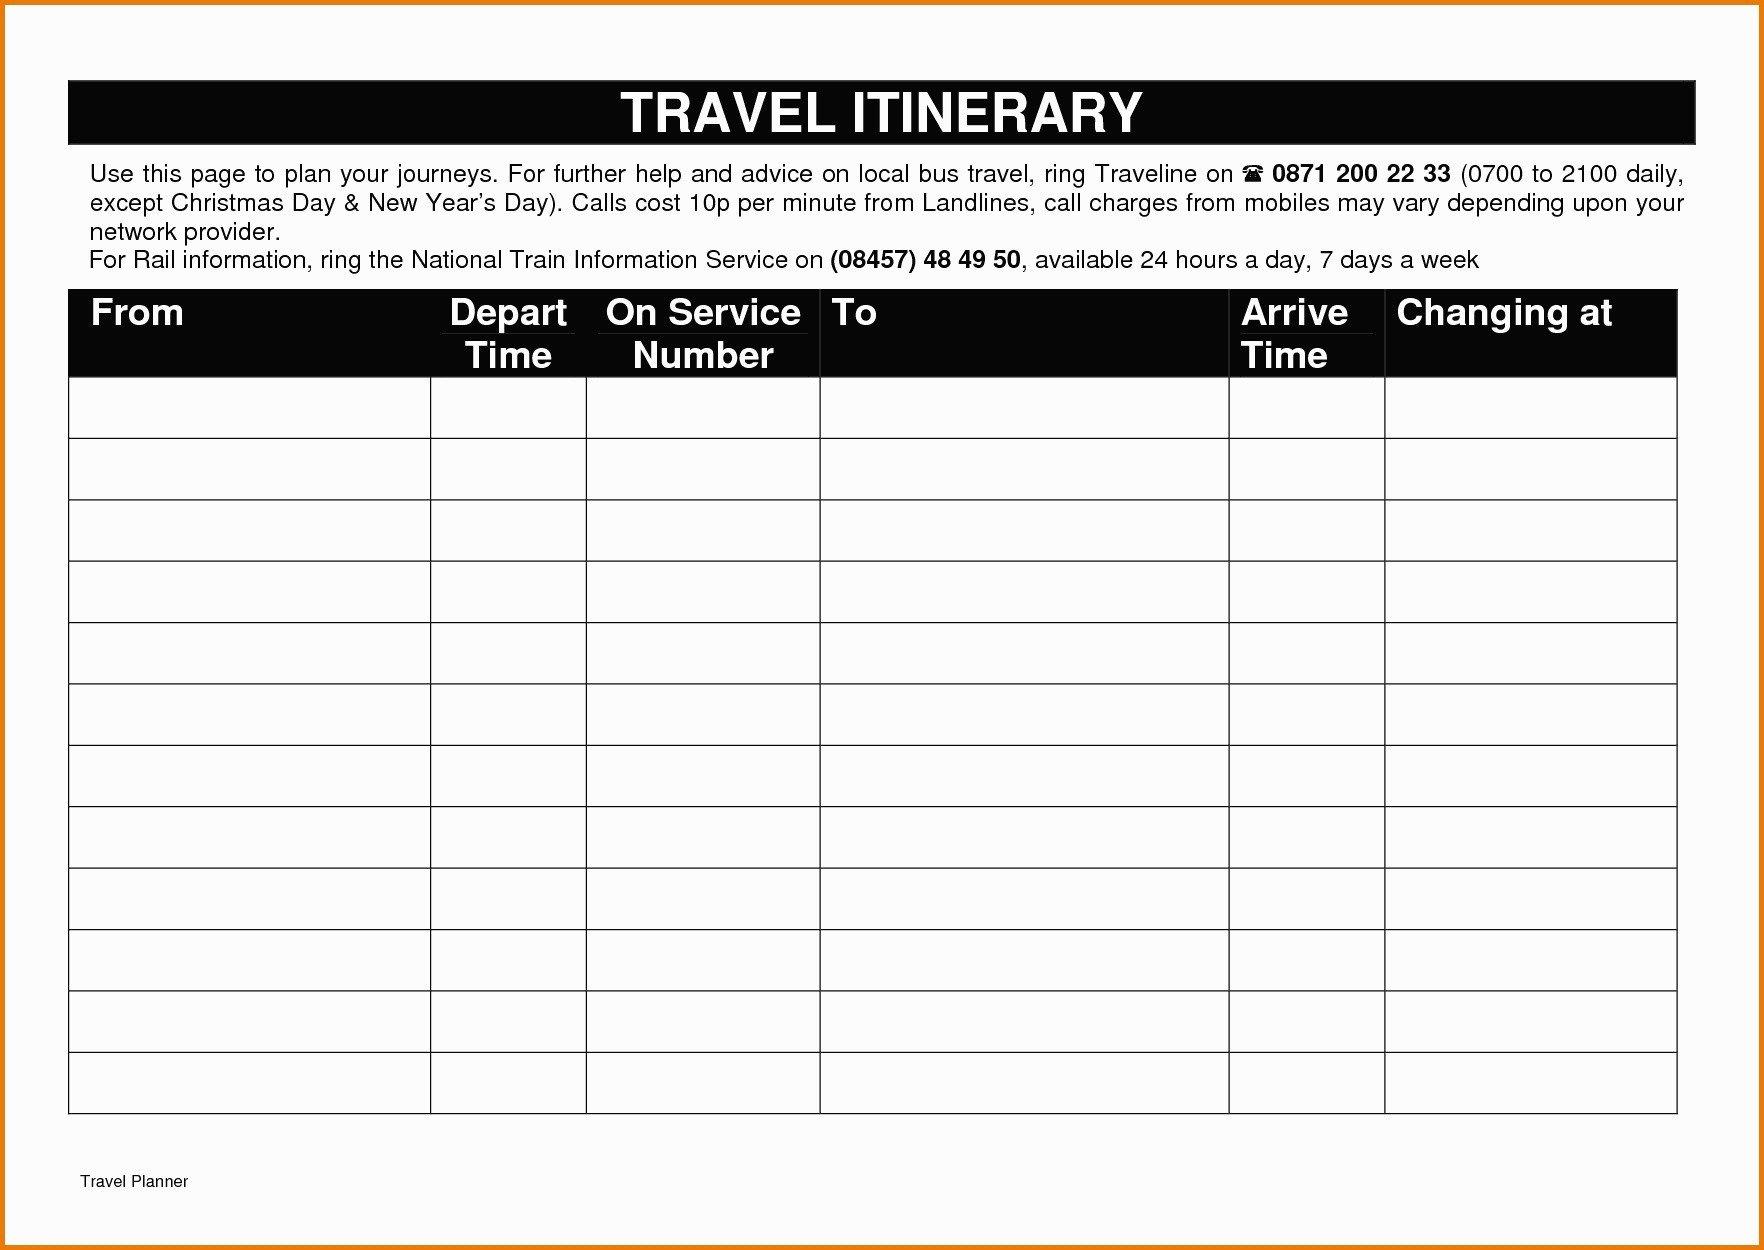 Travel Itinerary Template Google Docs Itinerary Template Google Docs Five Things Nobody told You